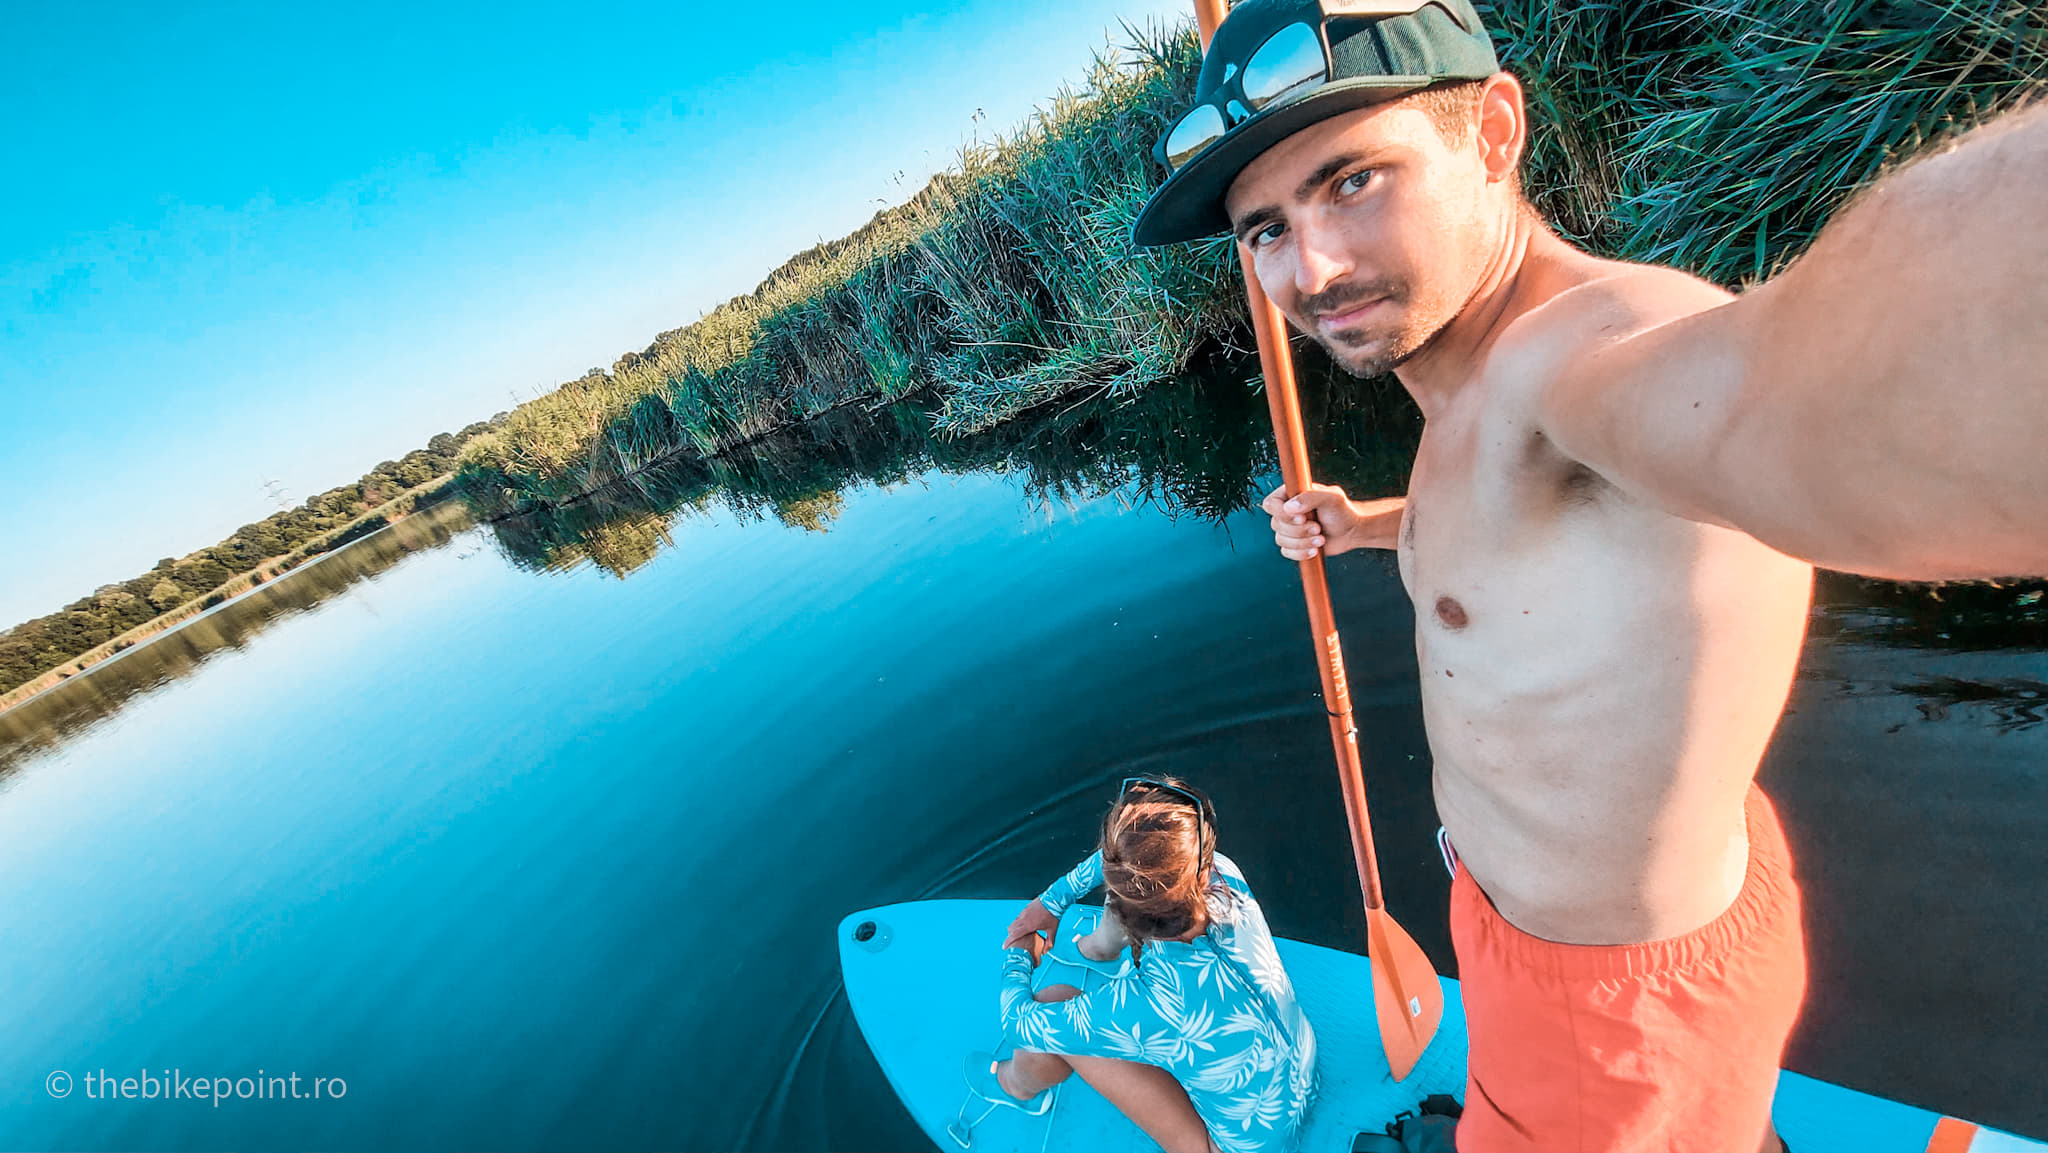 Am indraznit si un mic selfie pe SUP